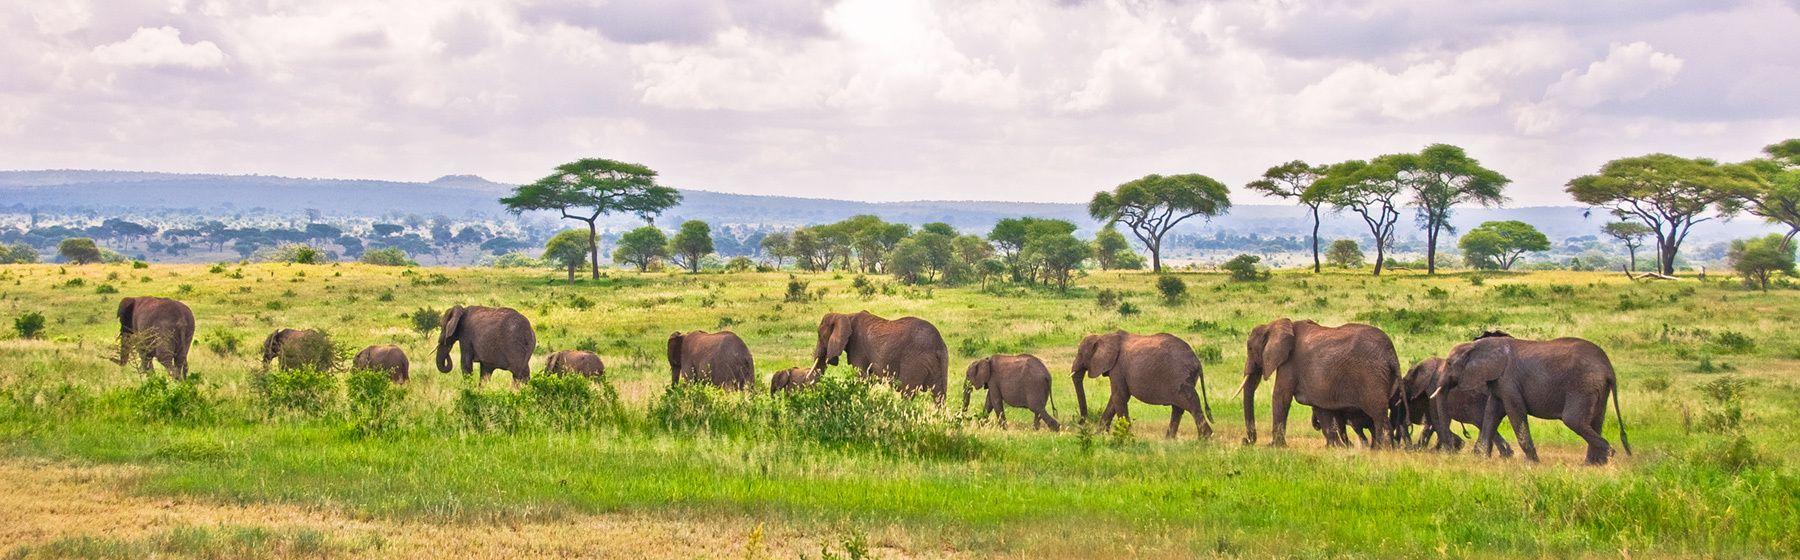 Elephant Parade, Tarangire National Park, Tanzania